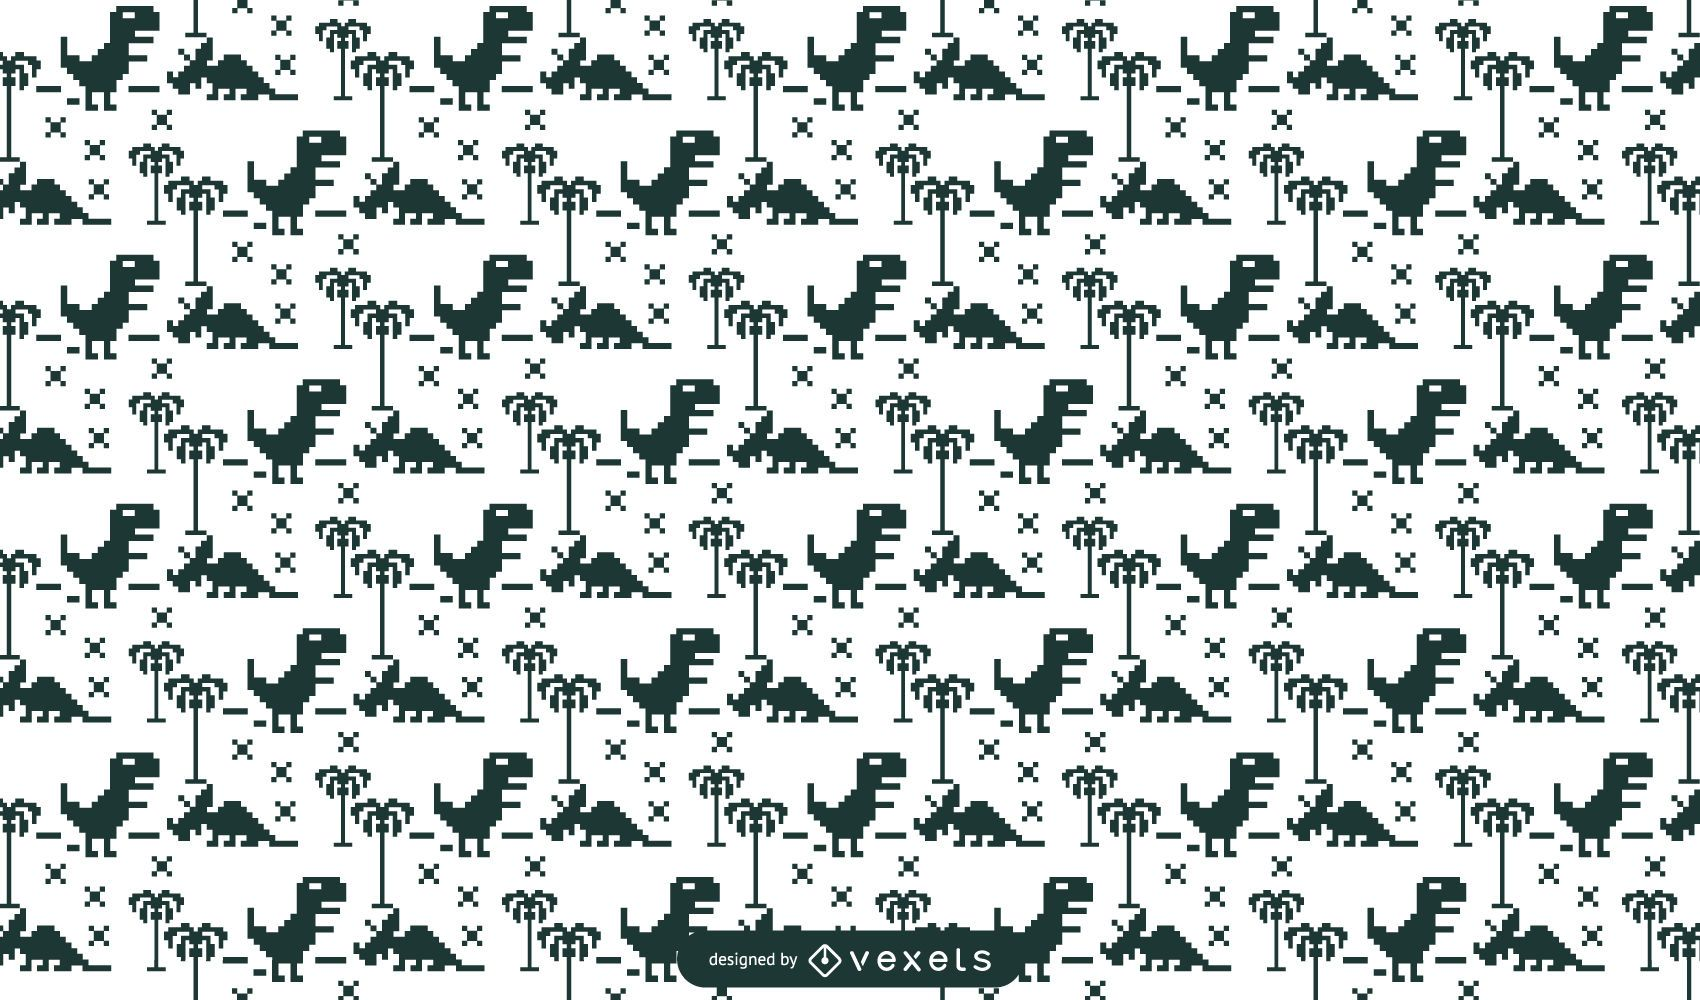 Pixelated dinos pattern design